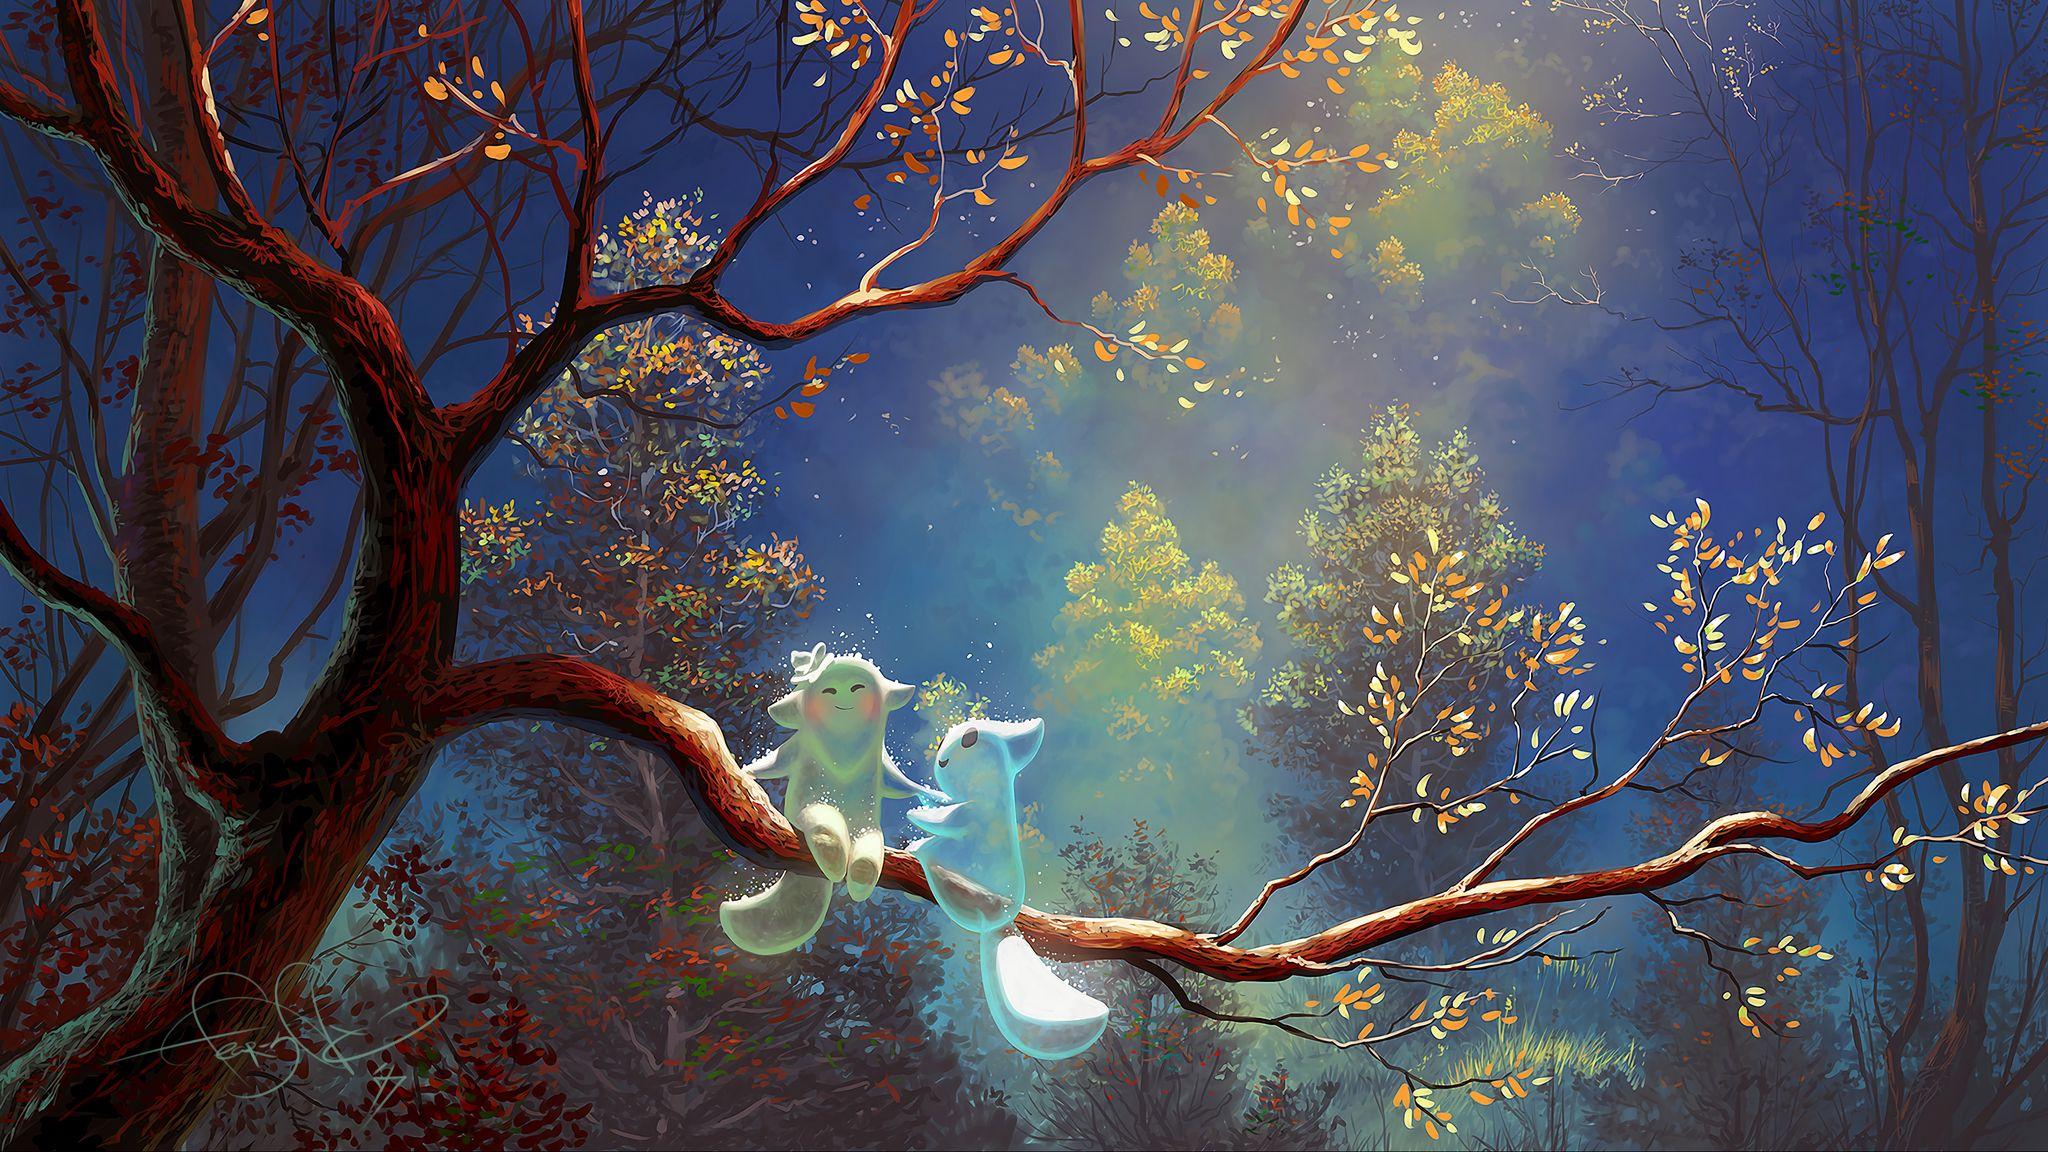 2048x1152 Wallpaper animals, tree, branch, magic, art, fantasy